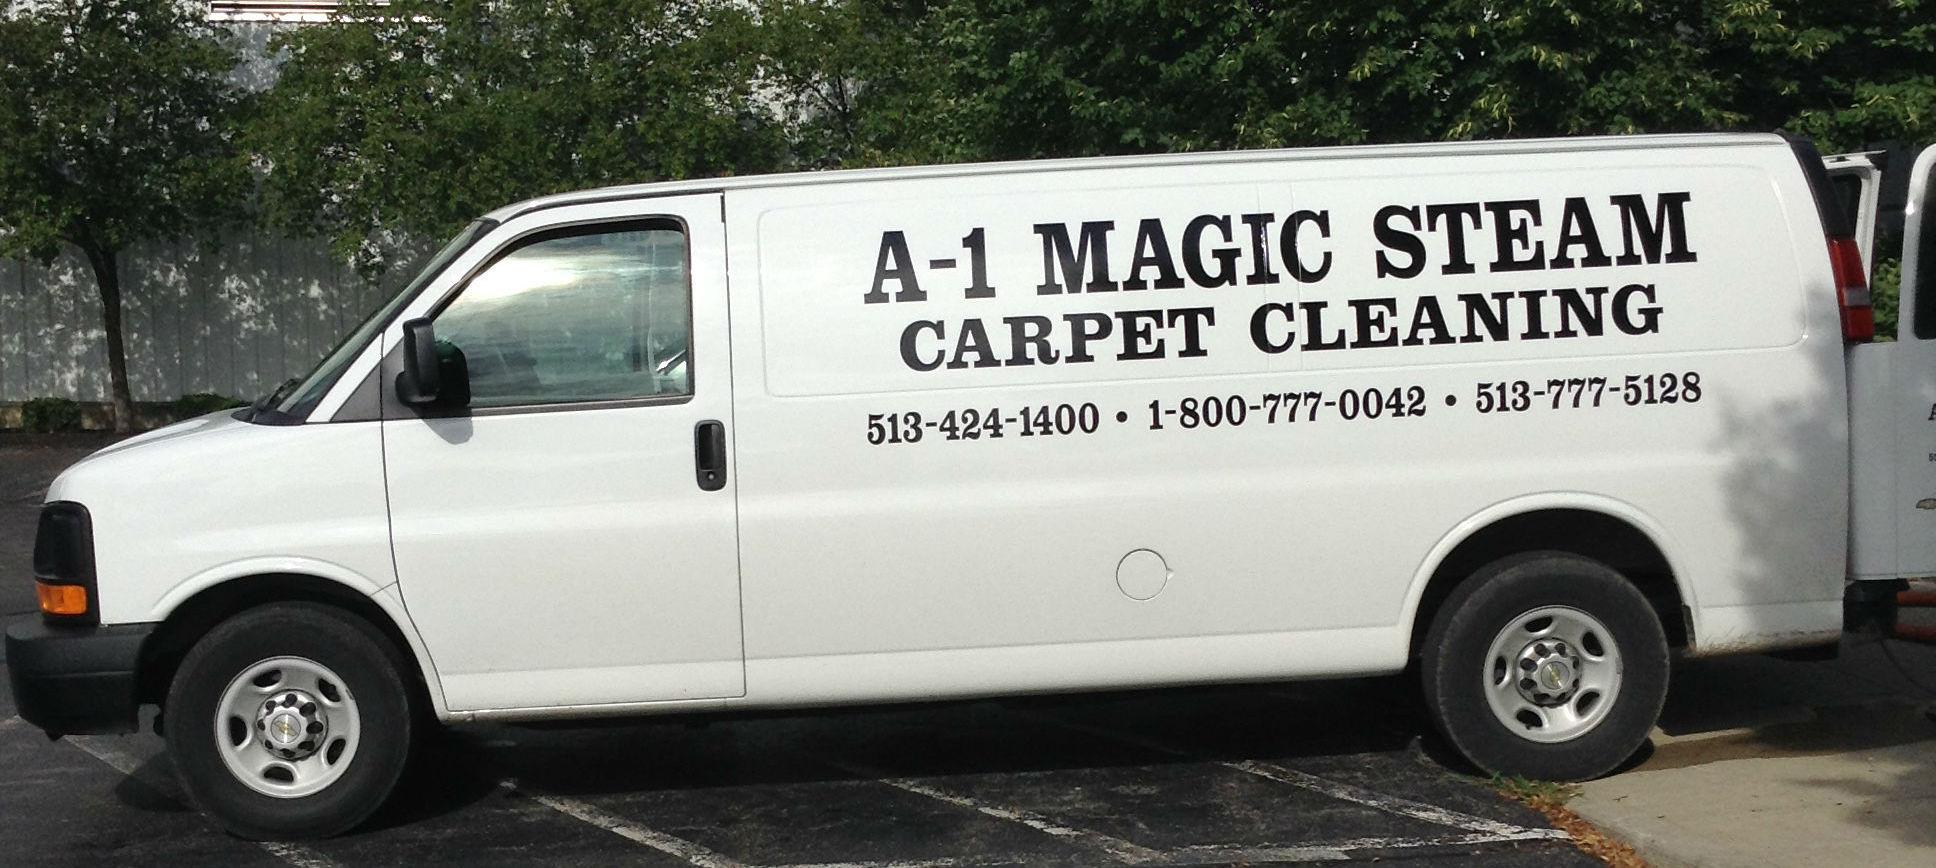 carpet magic steam machine parts